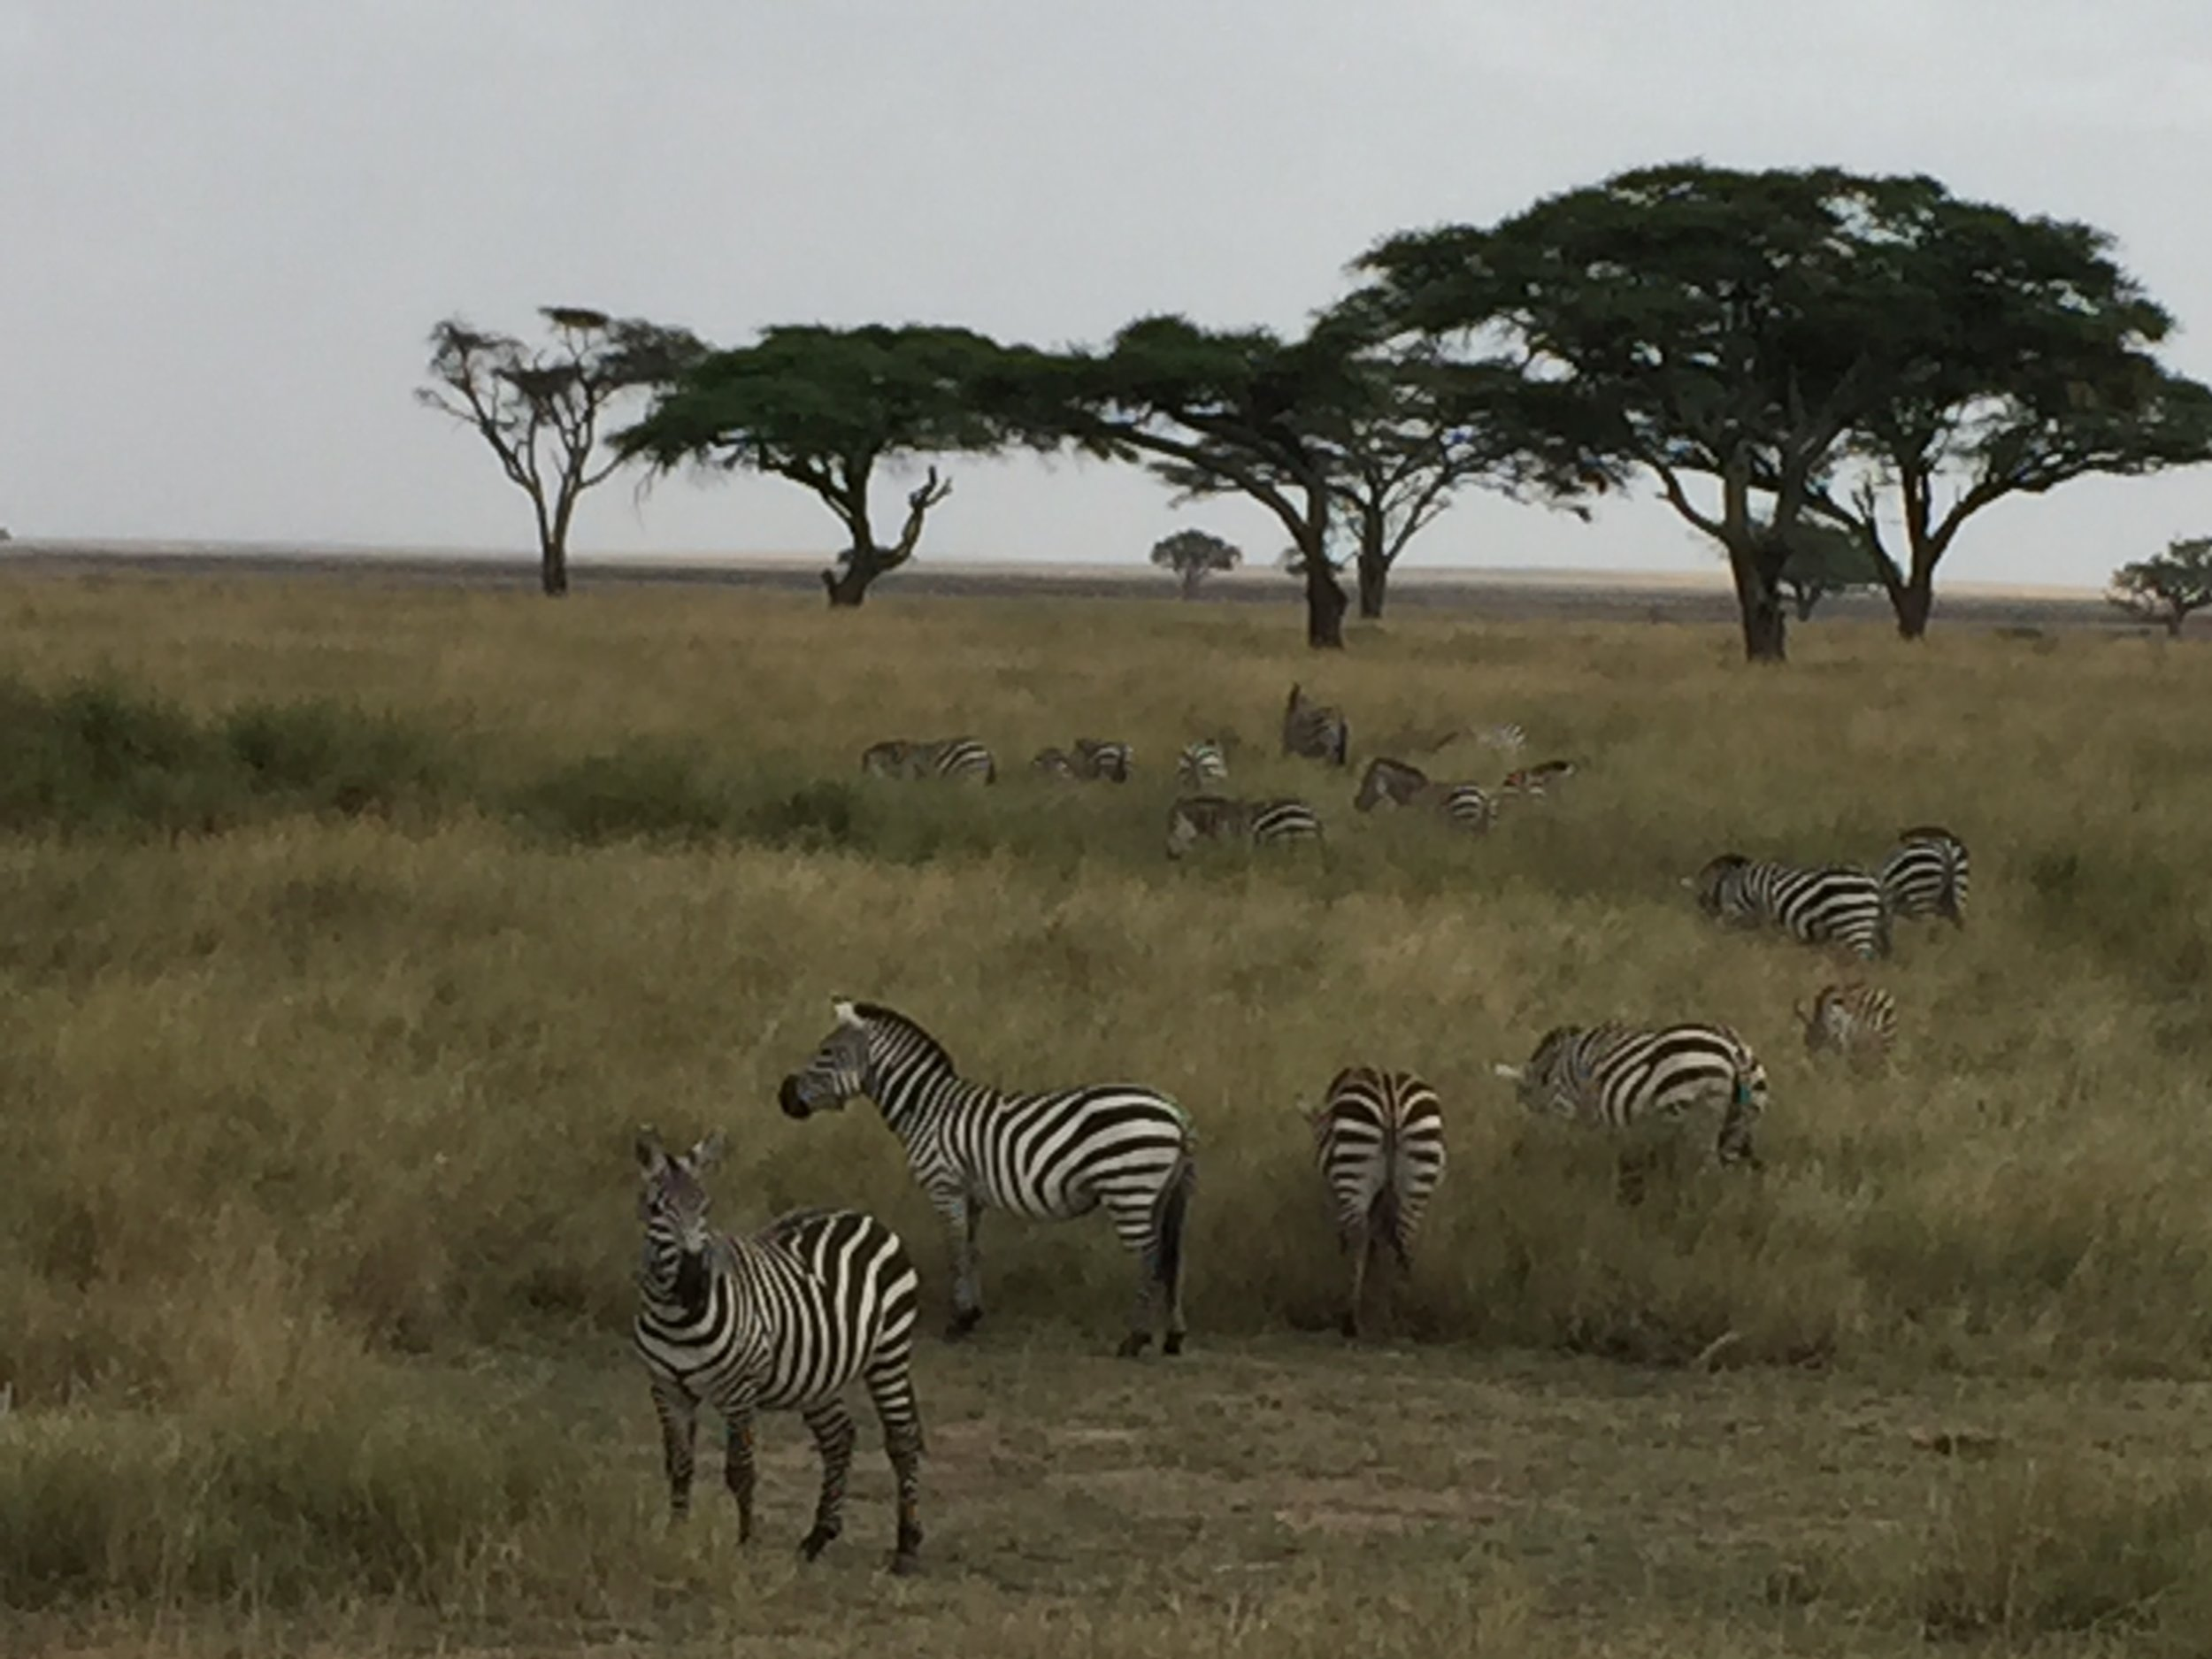 Serengeti National Park in Tanzania. Photo by Betsy Herbert 2015